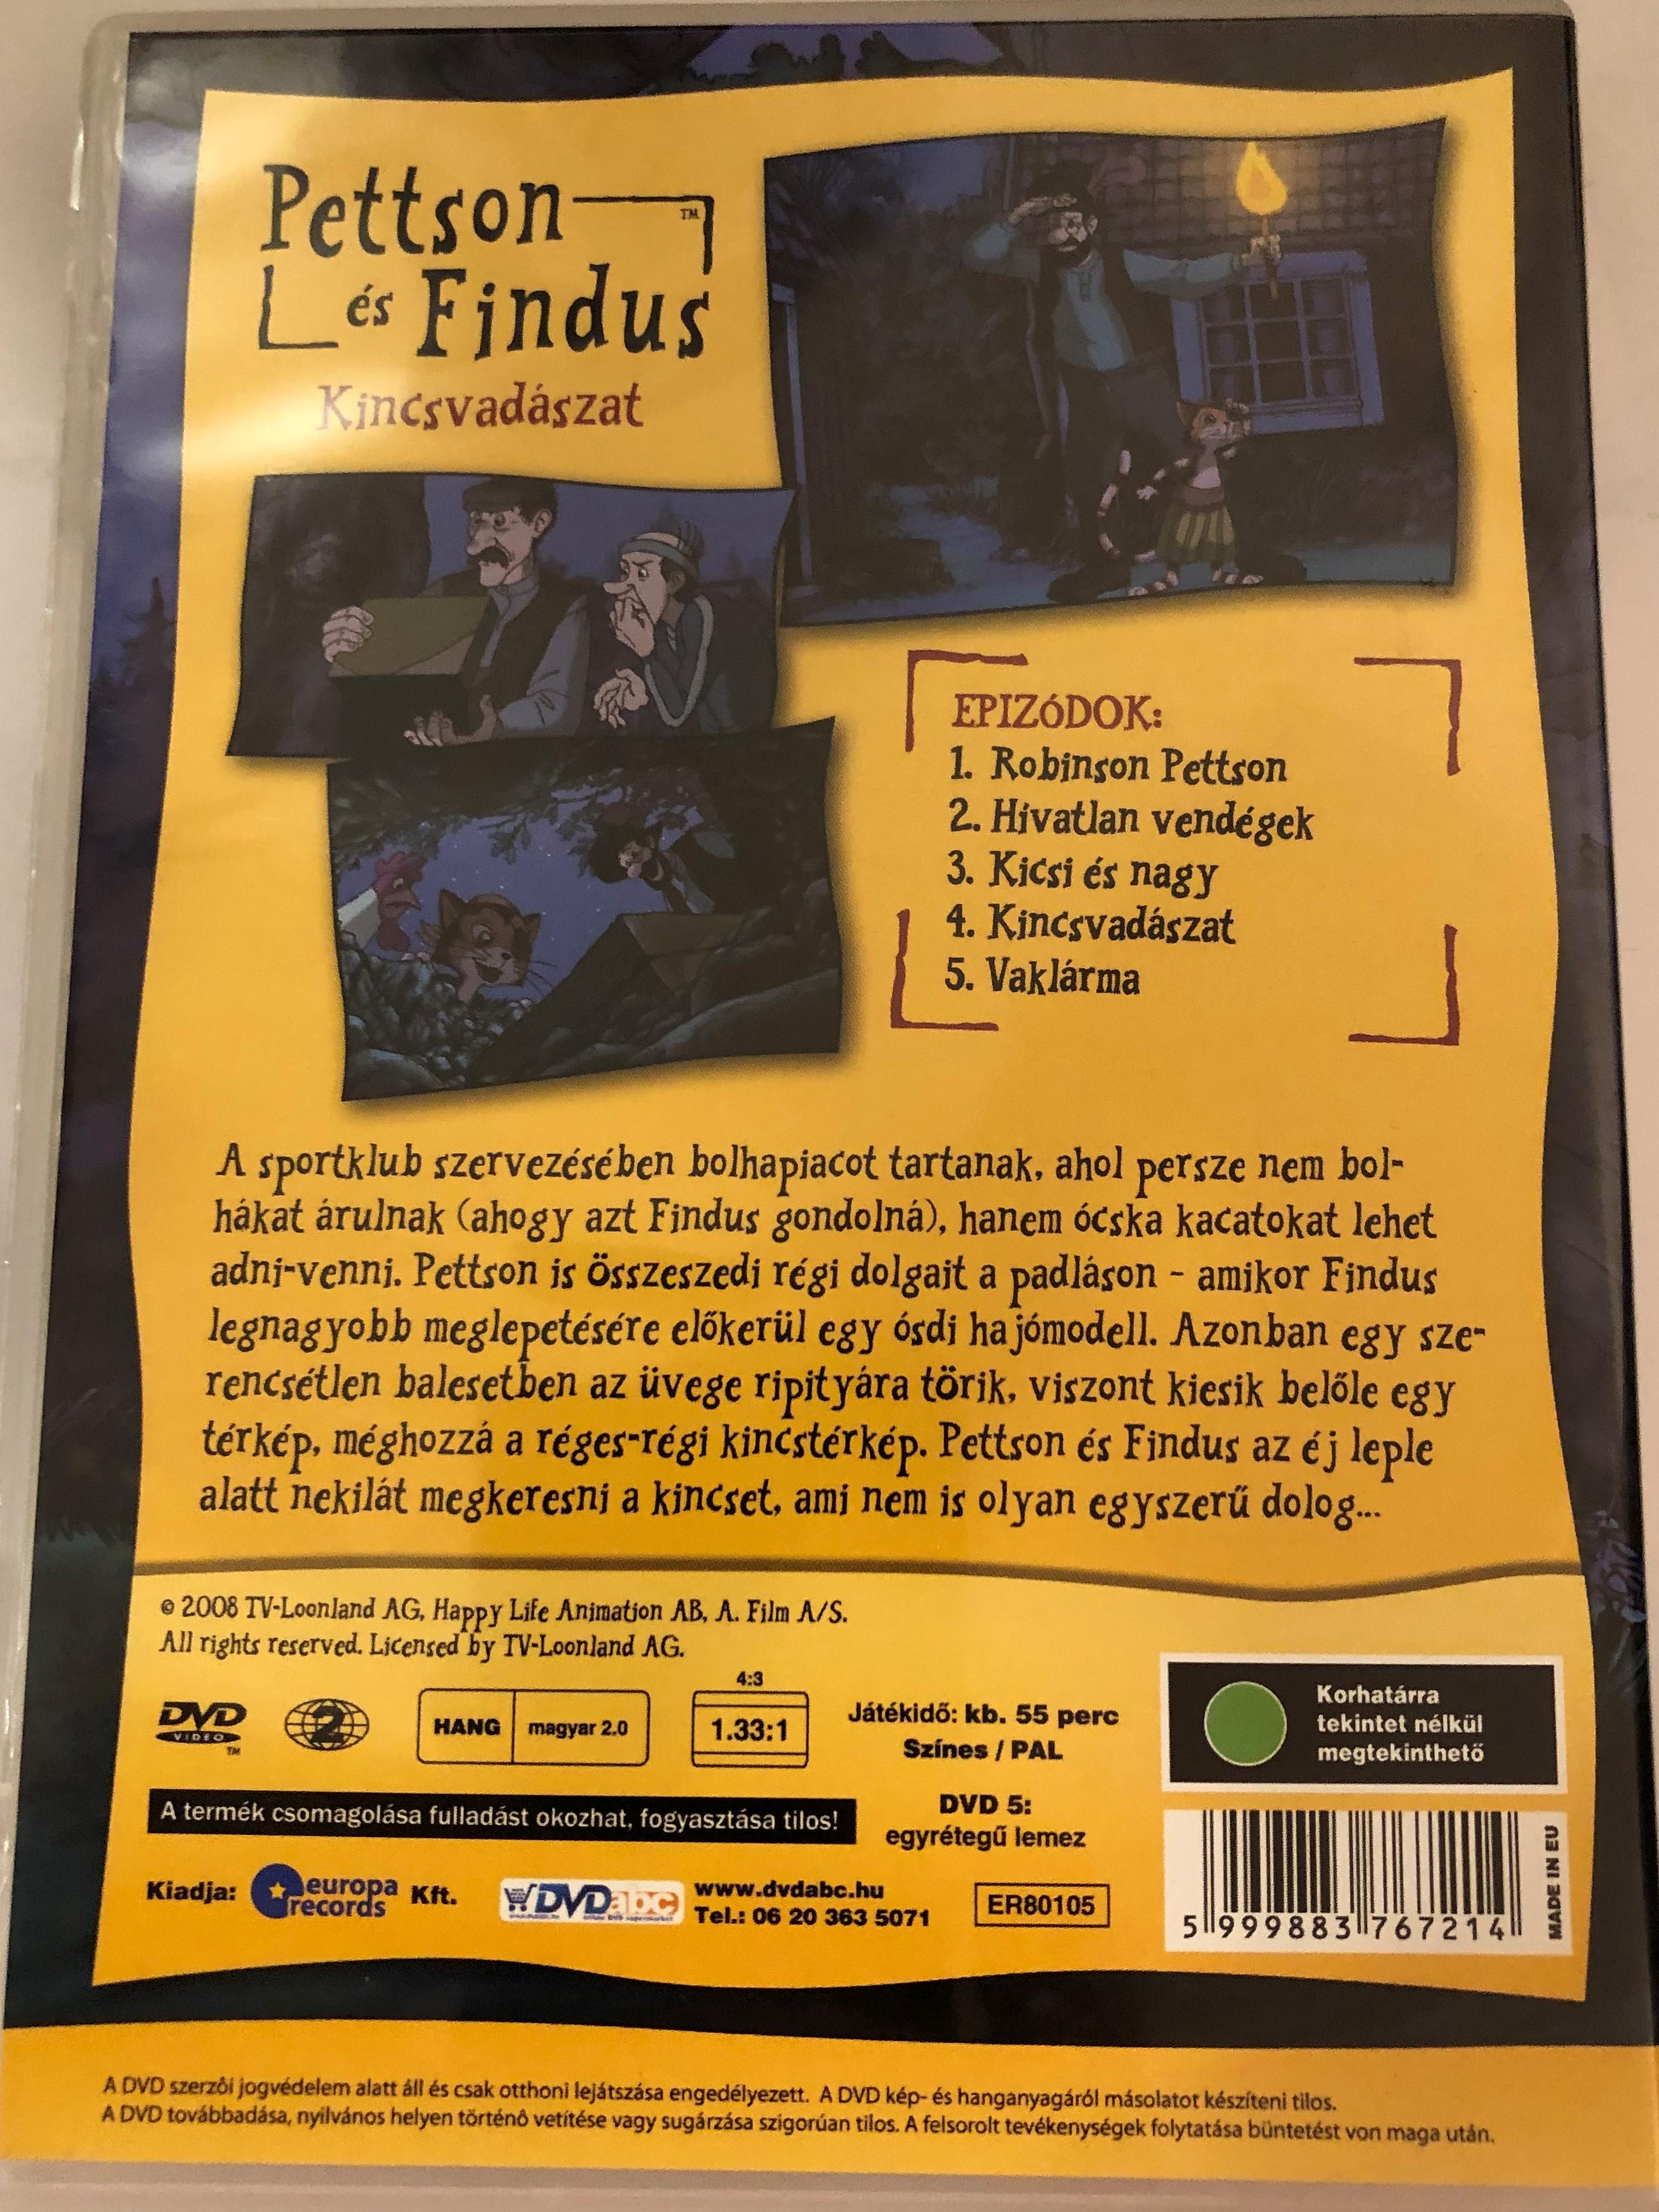 pettsson-och-findus-5.-dvd-pettson-s-findus-kincsvad-szat-5-episodes-2.jpg